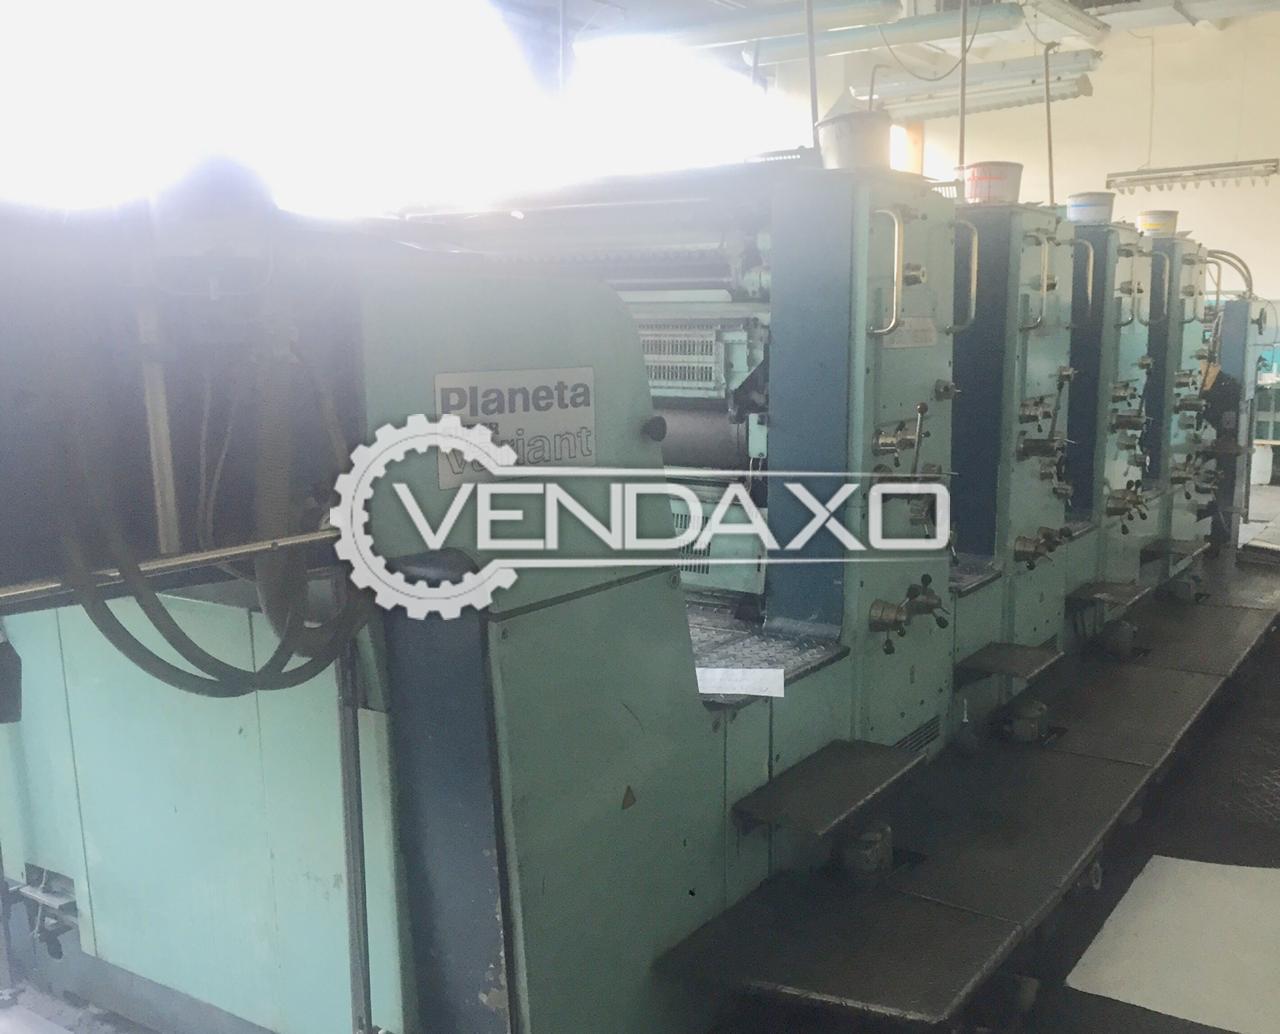 Planeta Super Variant P44-82 Offset Printing Machine - 28 x 40 Inch, 4 Color